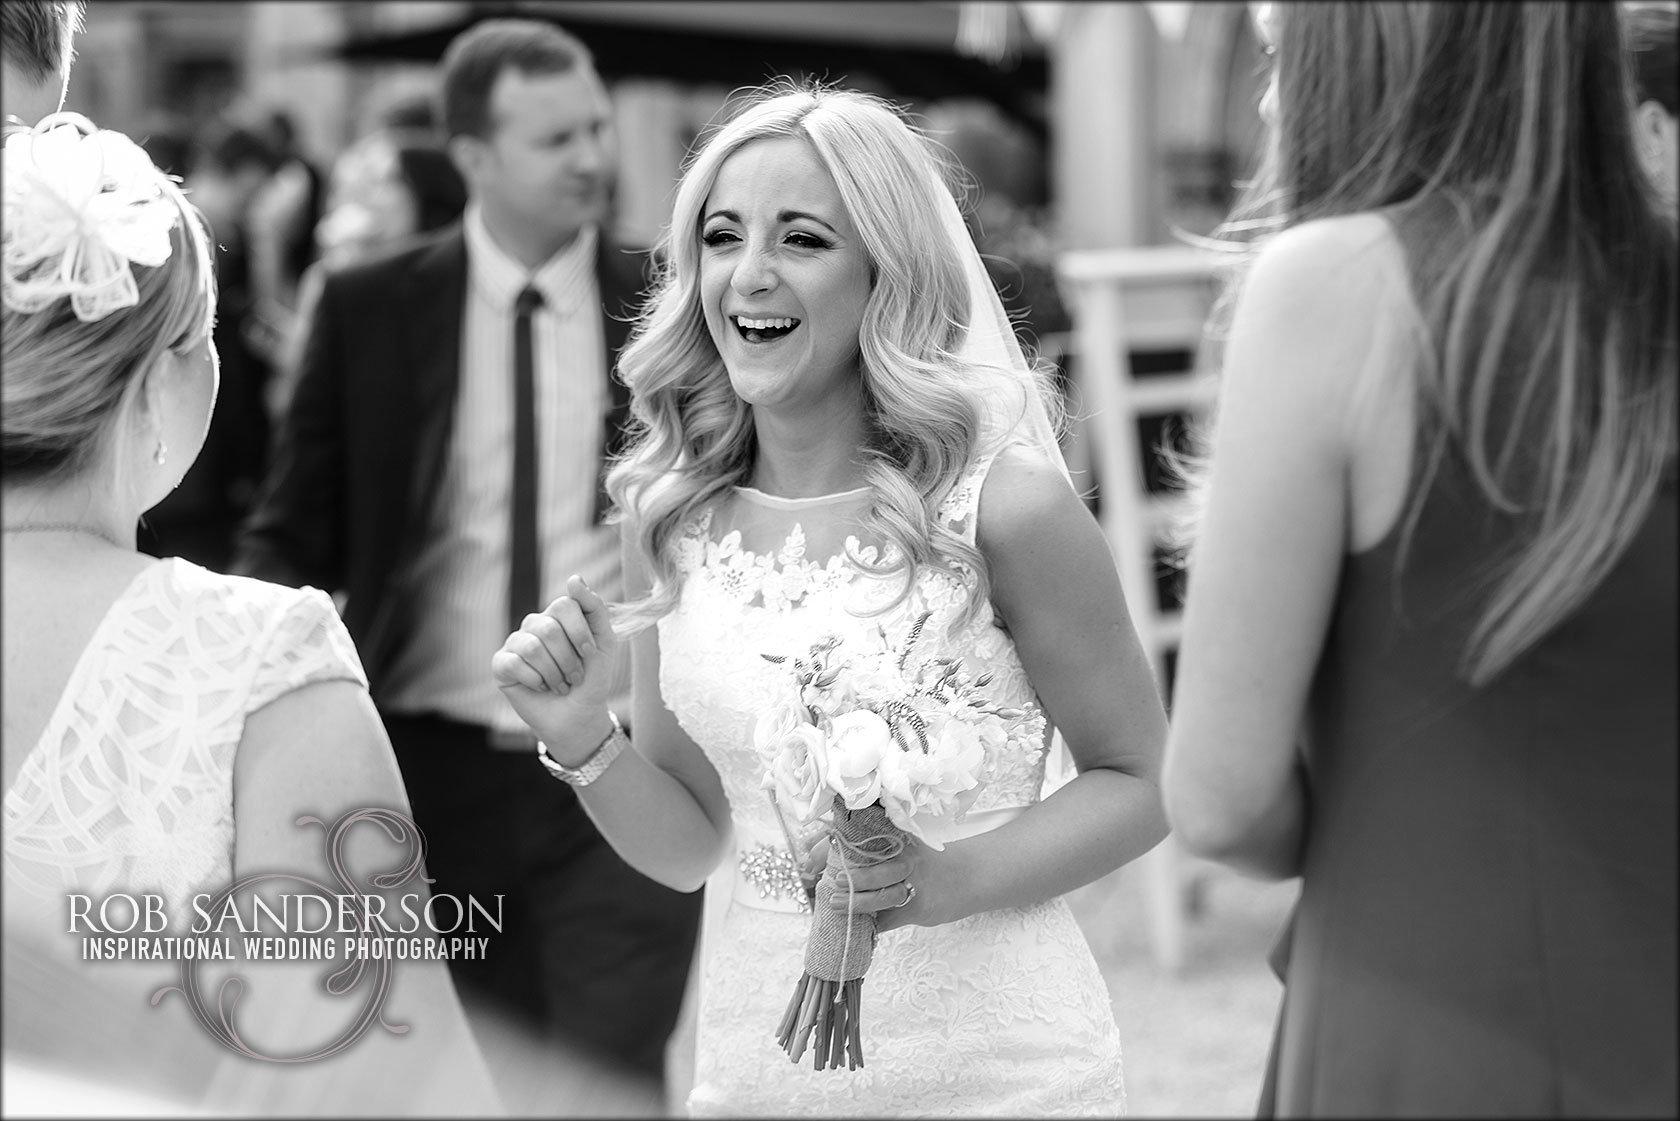 Mia looks gorgeous in her wedding dress outside Soughton Hall